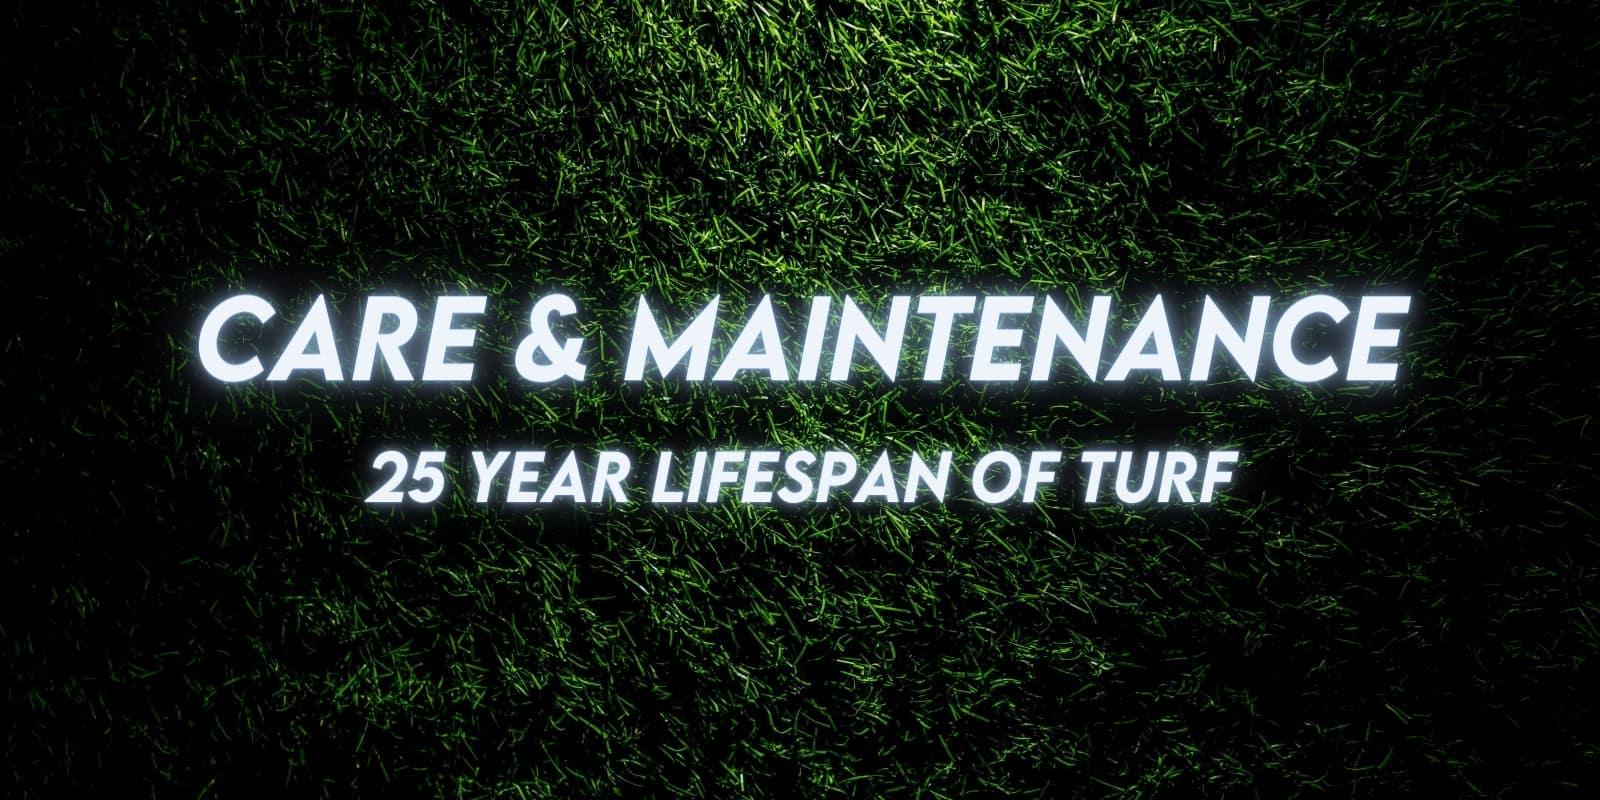 Care & Maintenance Costs [25 Year Lifespan of Turf]